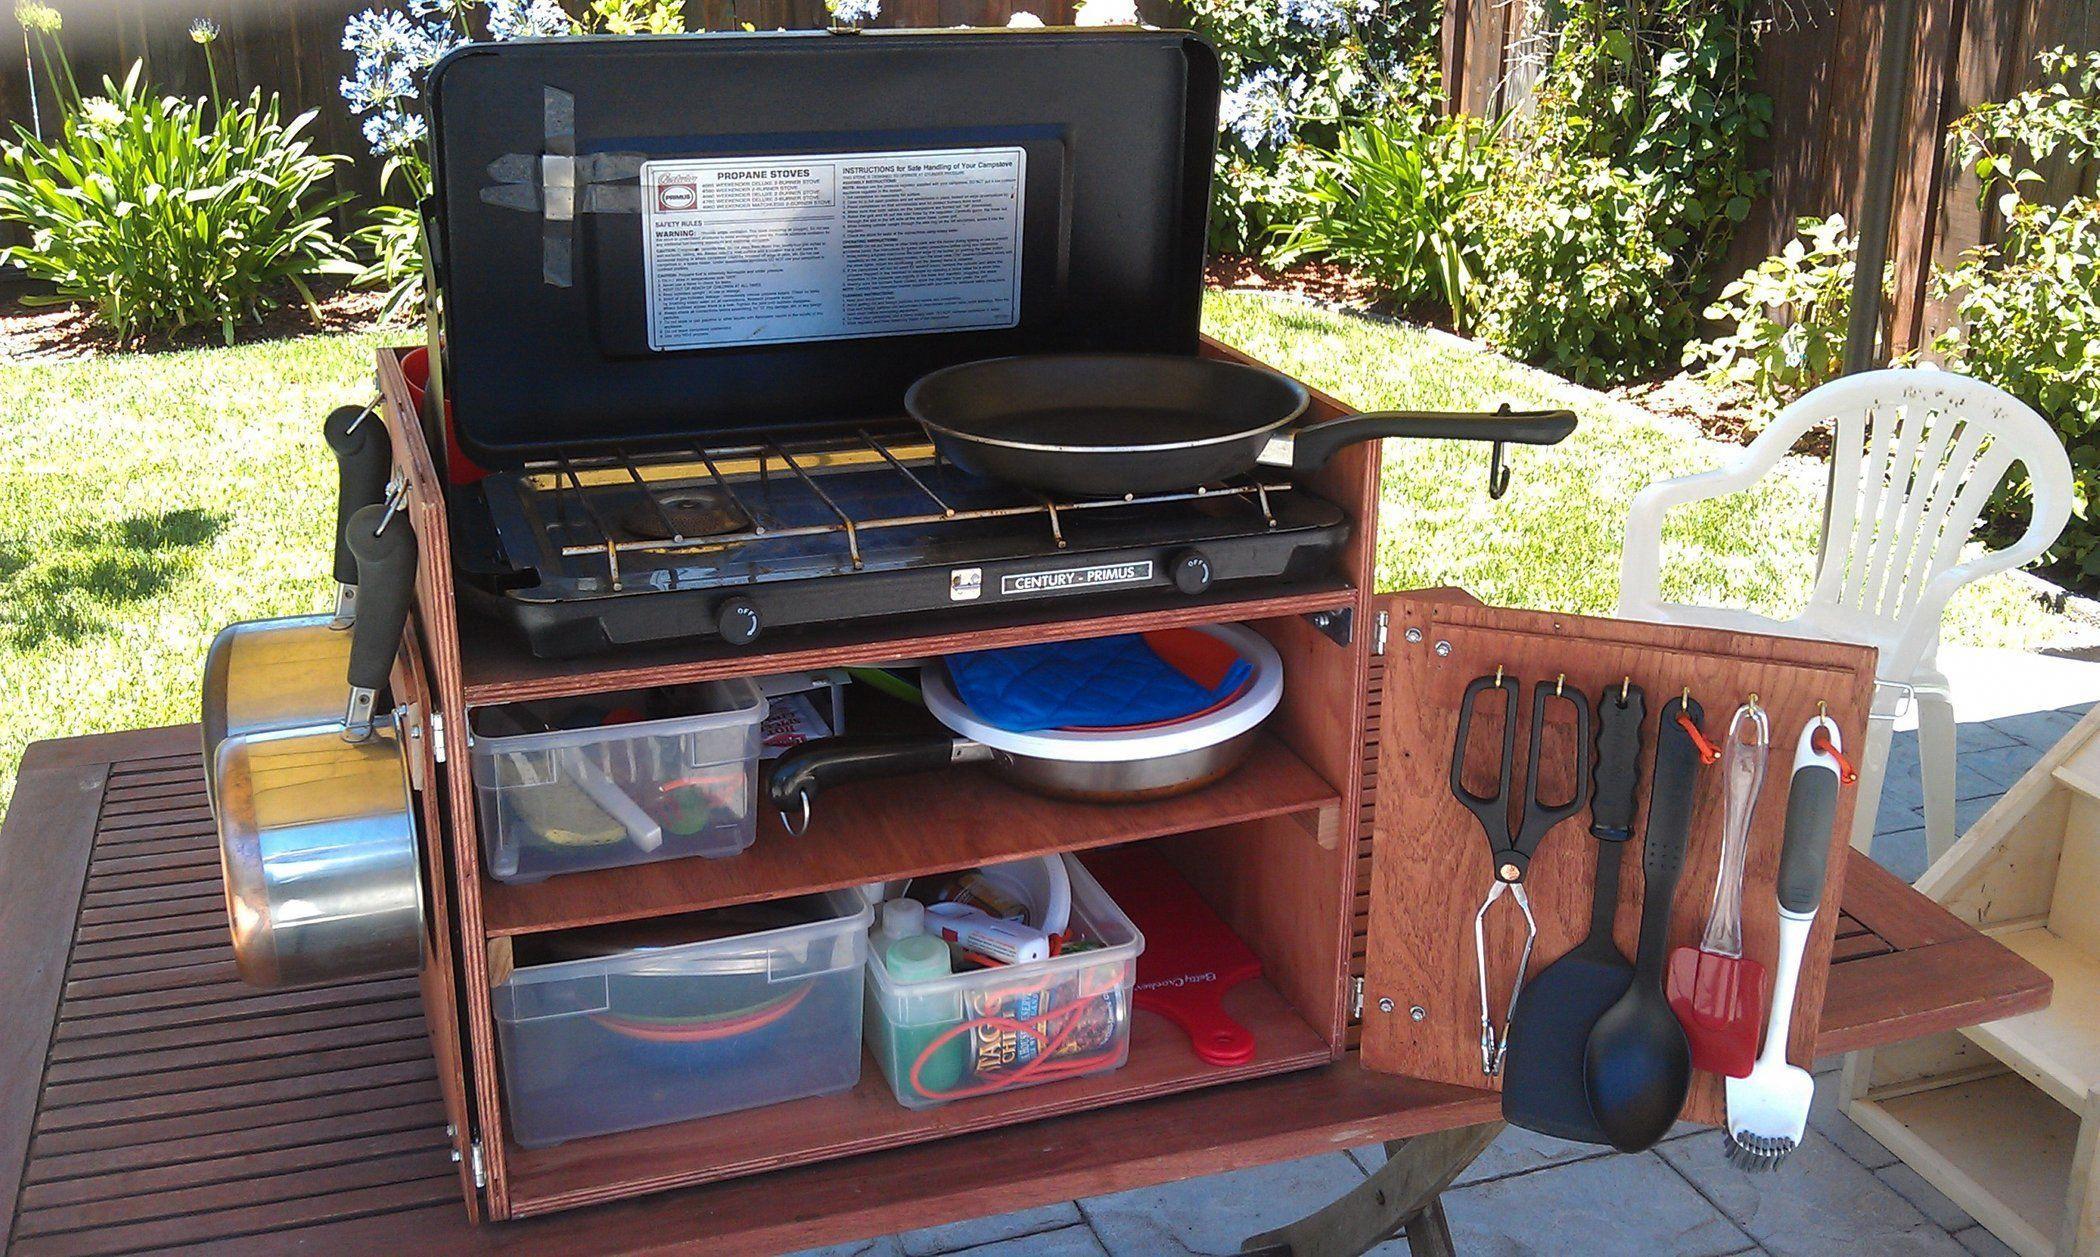 Chuck Box Camp Kitchen Review